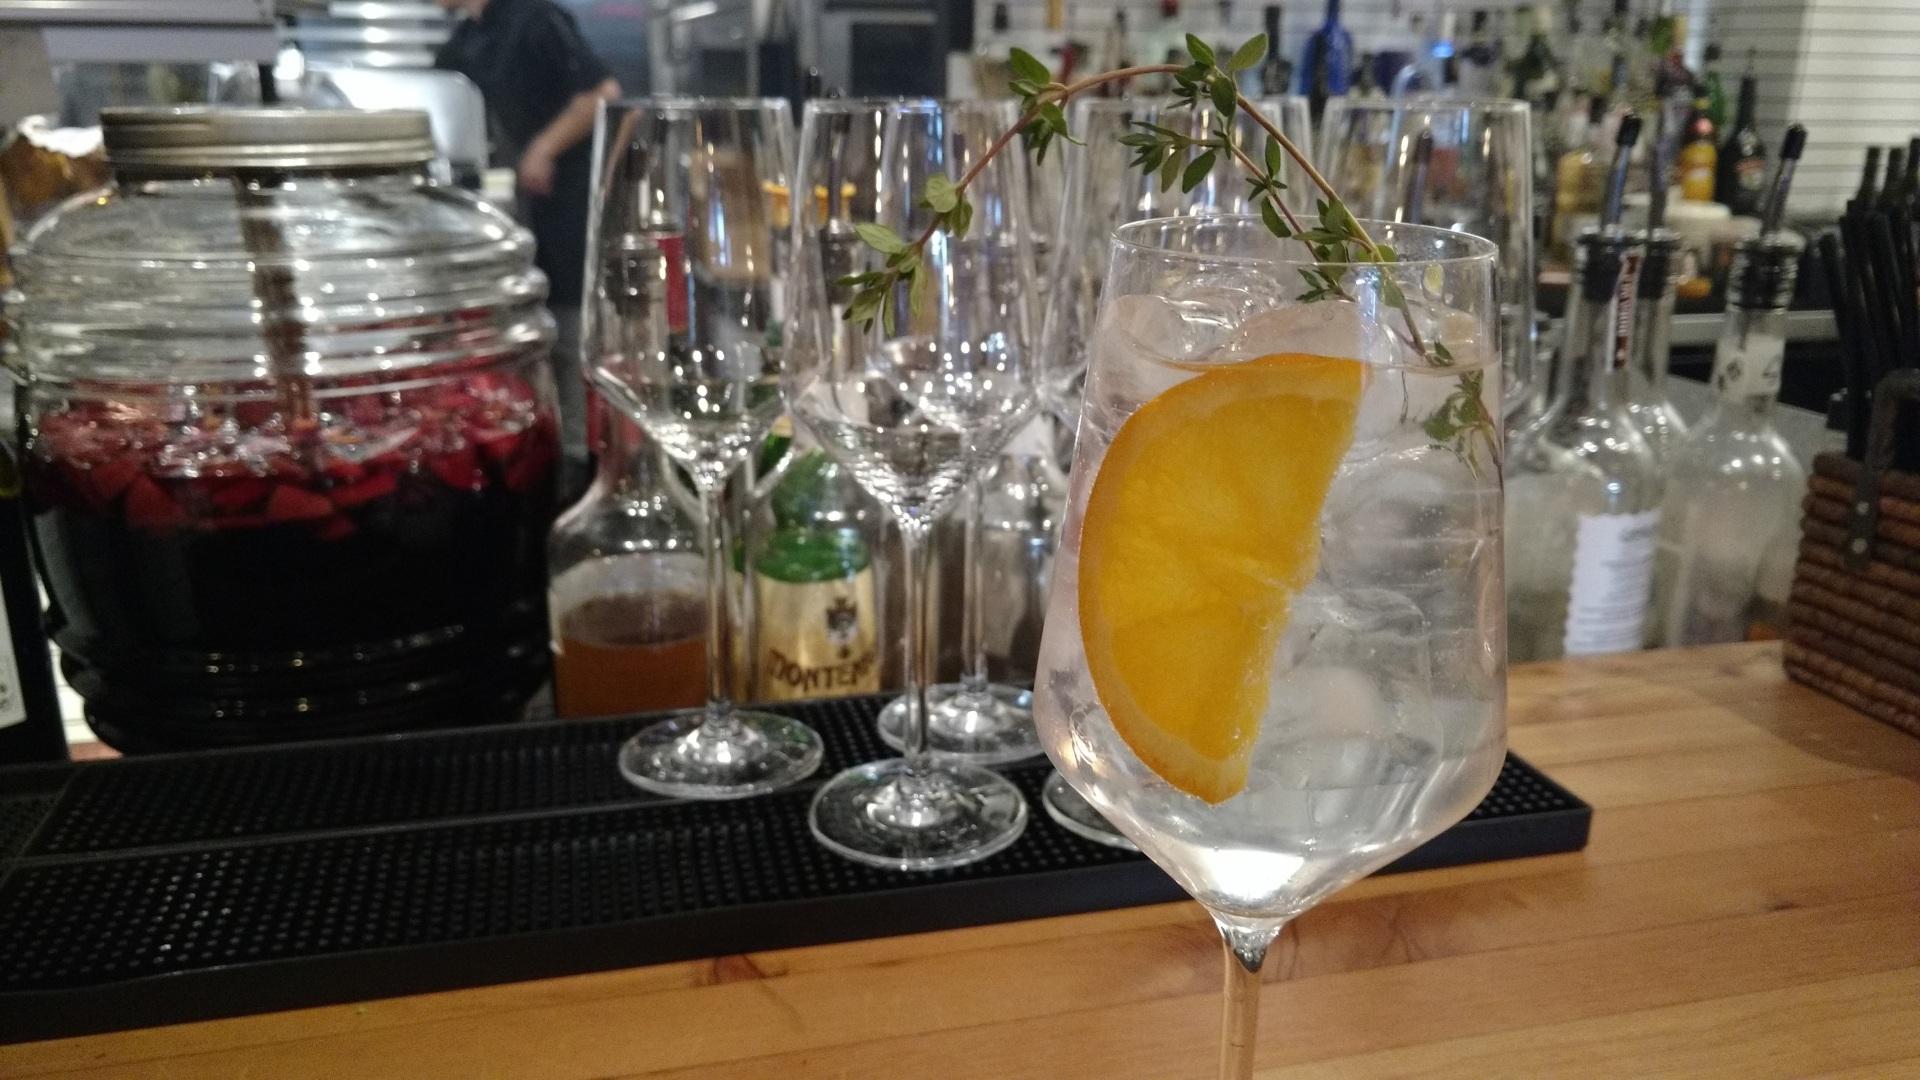 Spanish Gin and Tonic at Cabriota Tapas